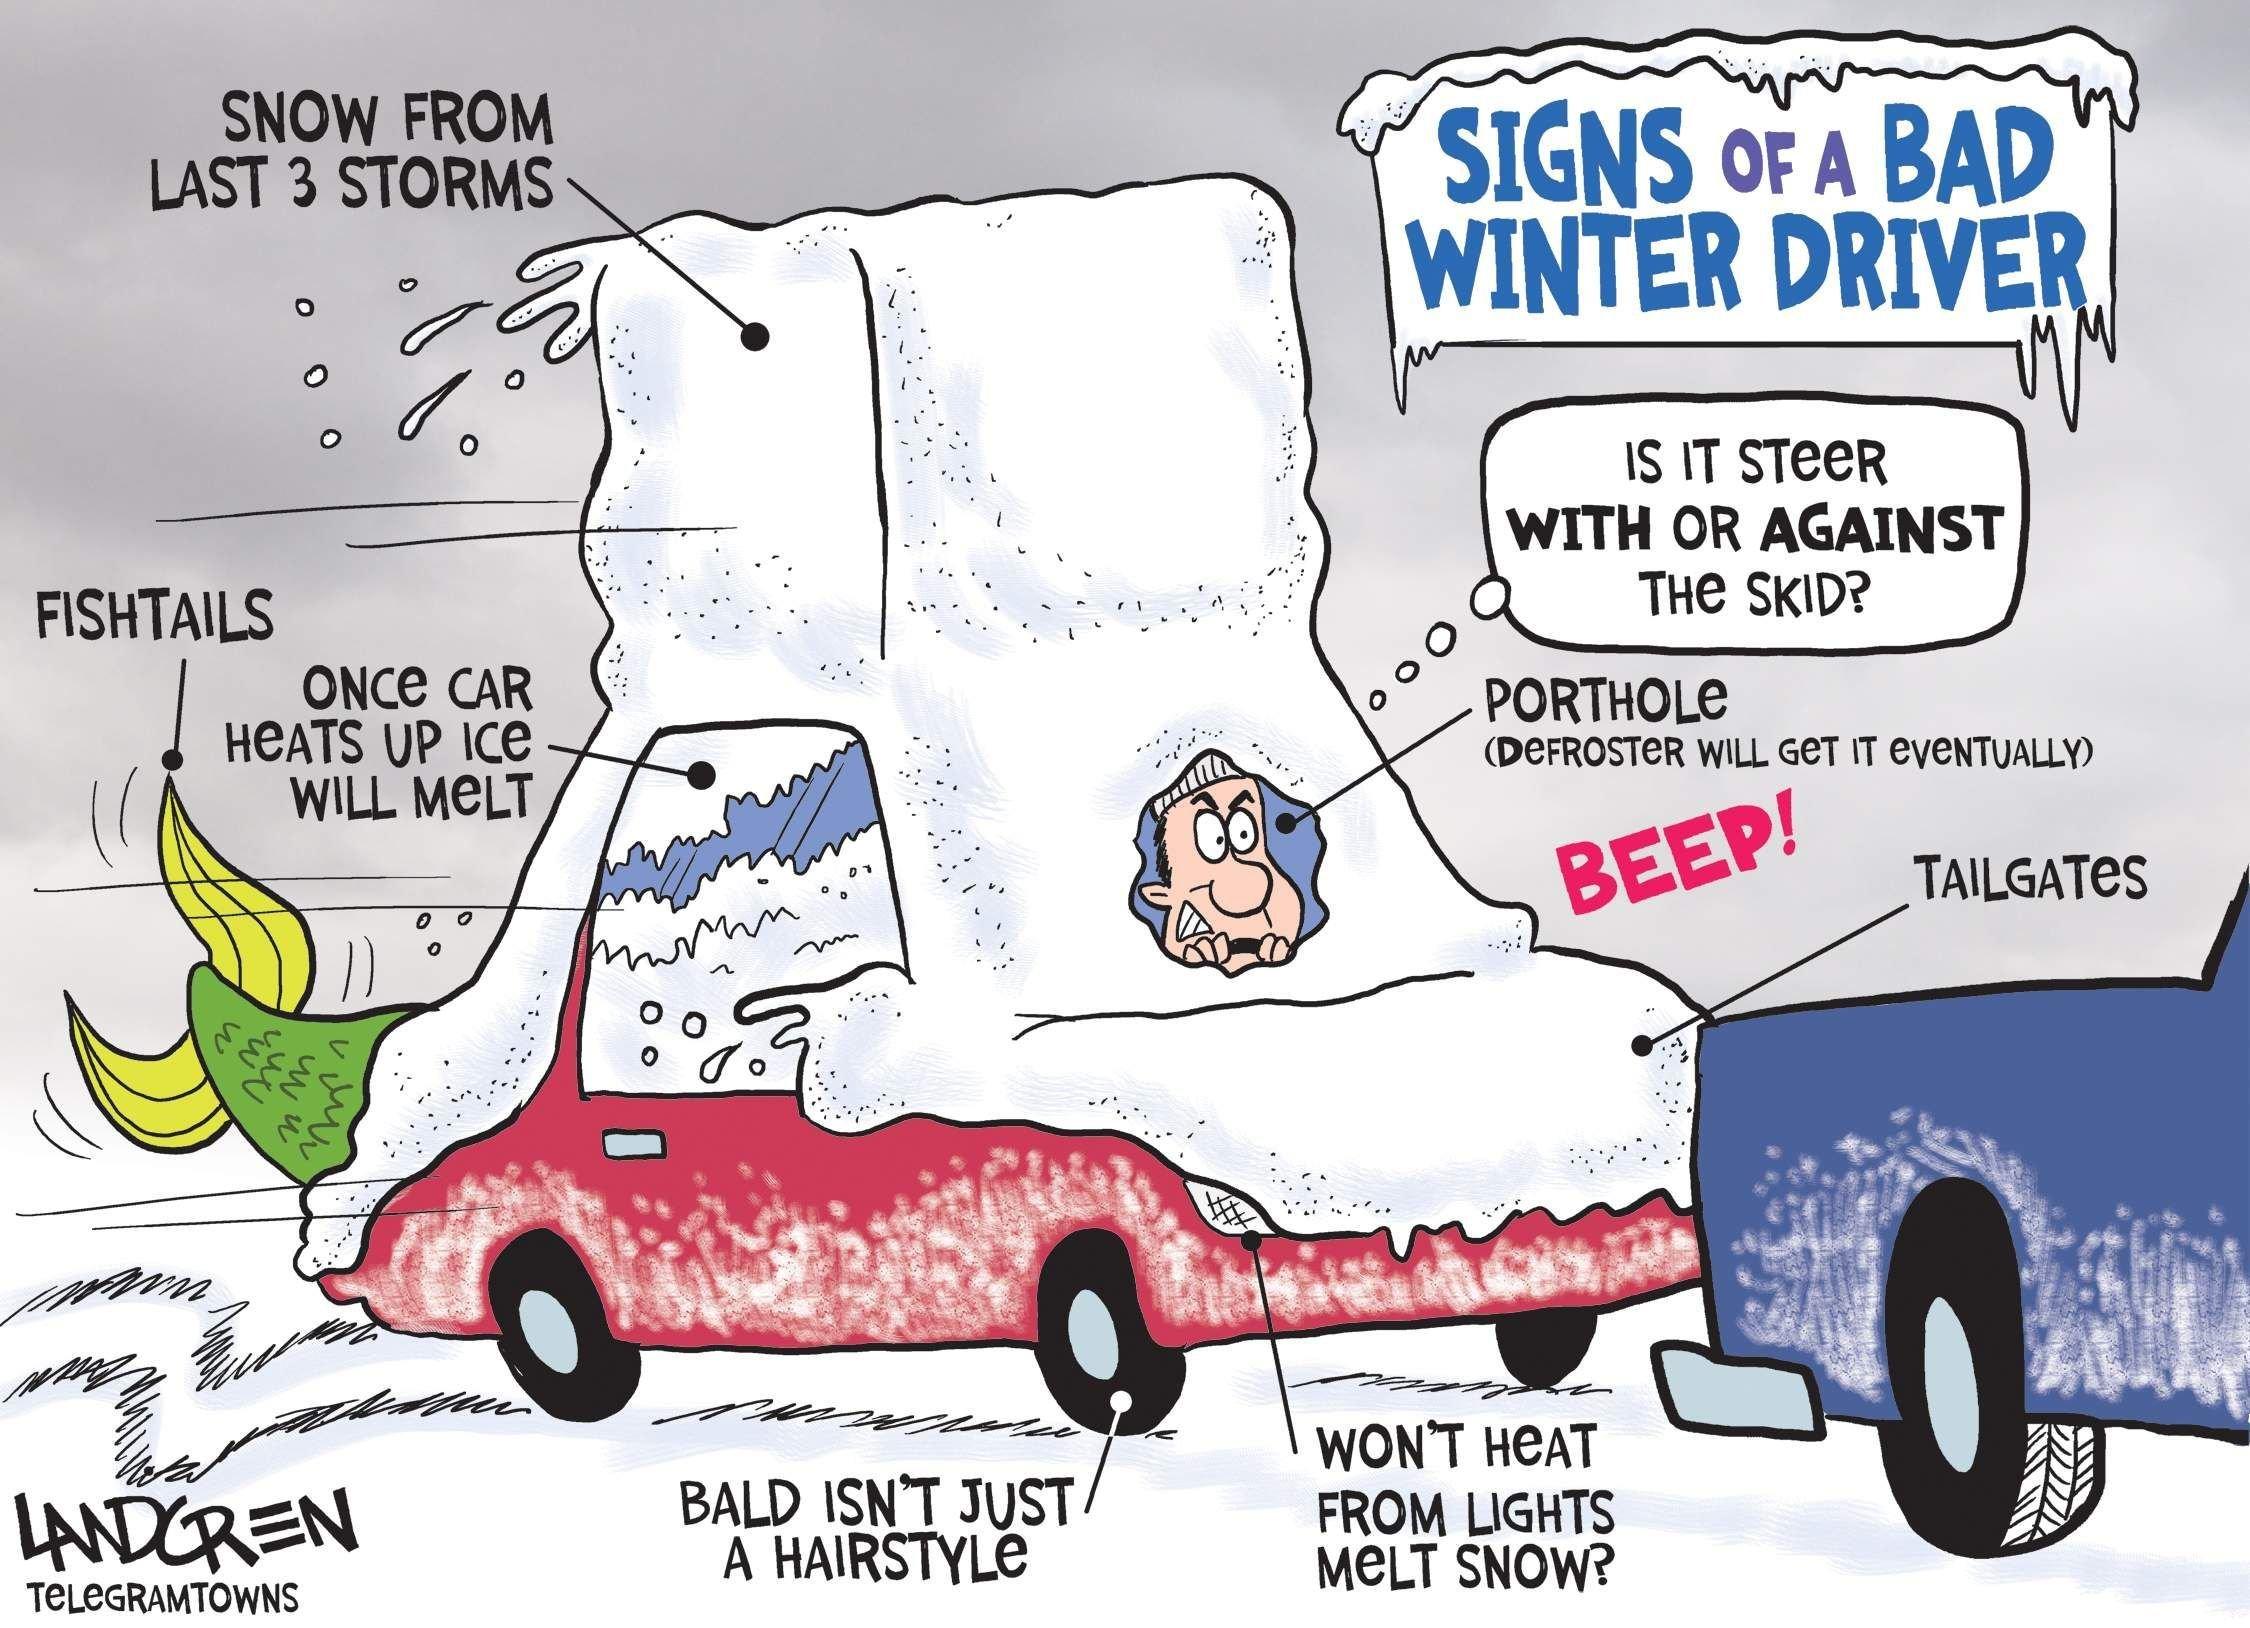 Winter driver cartoon